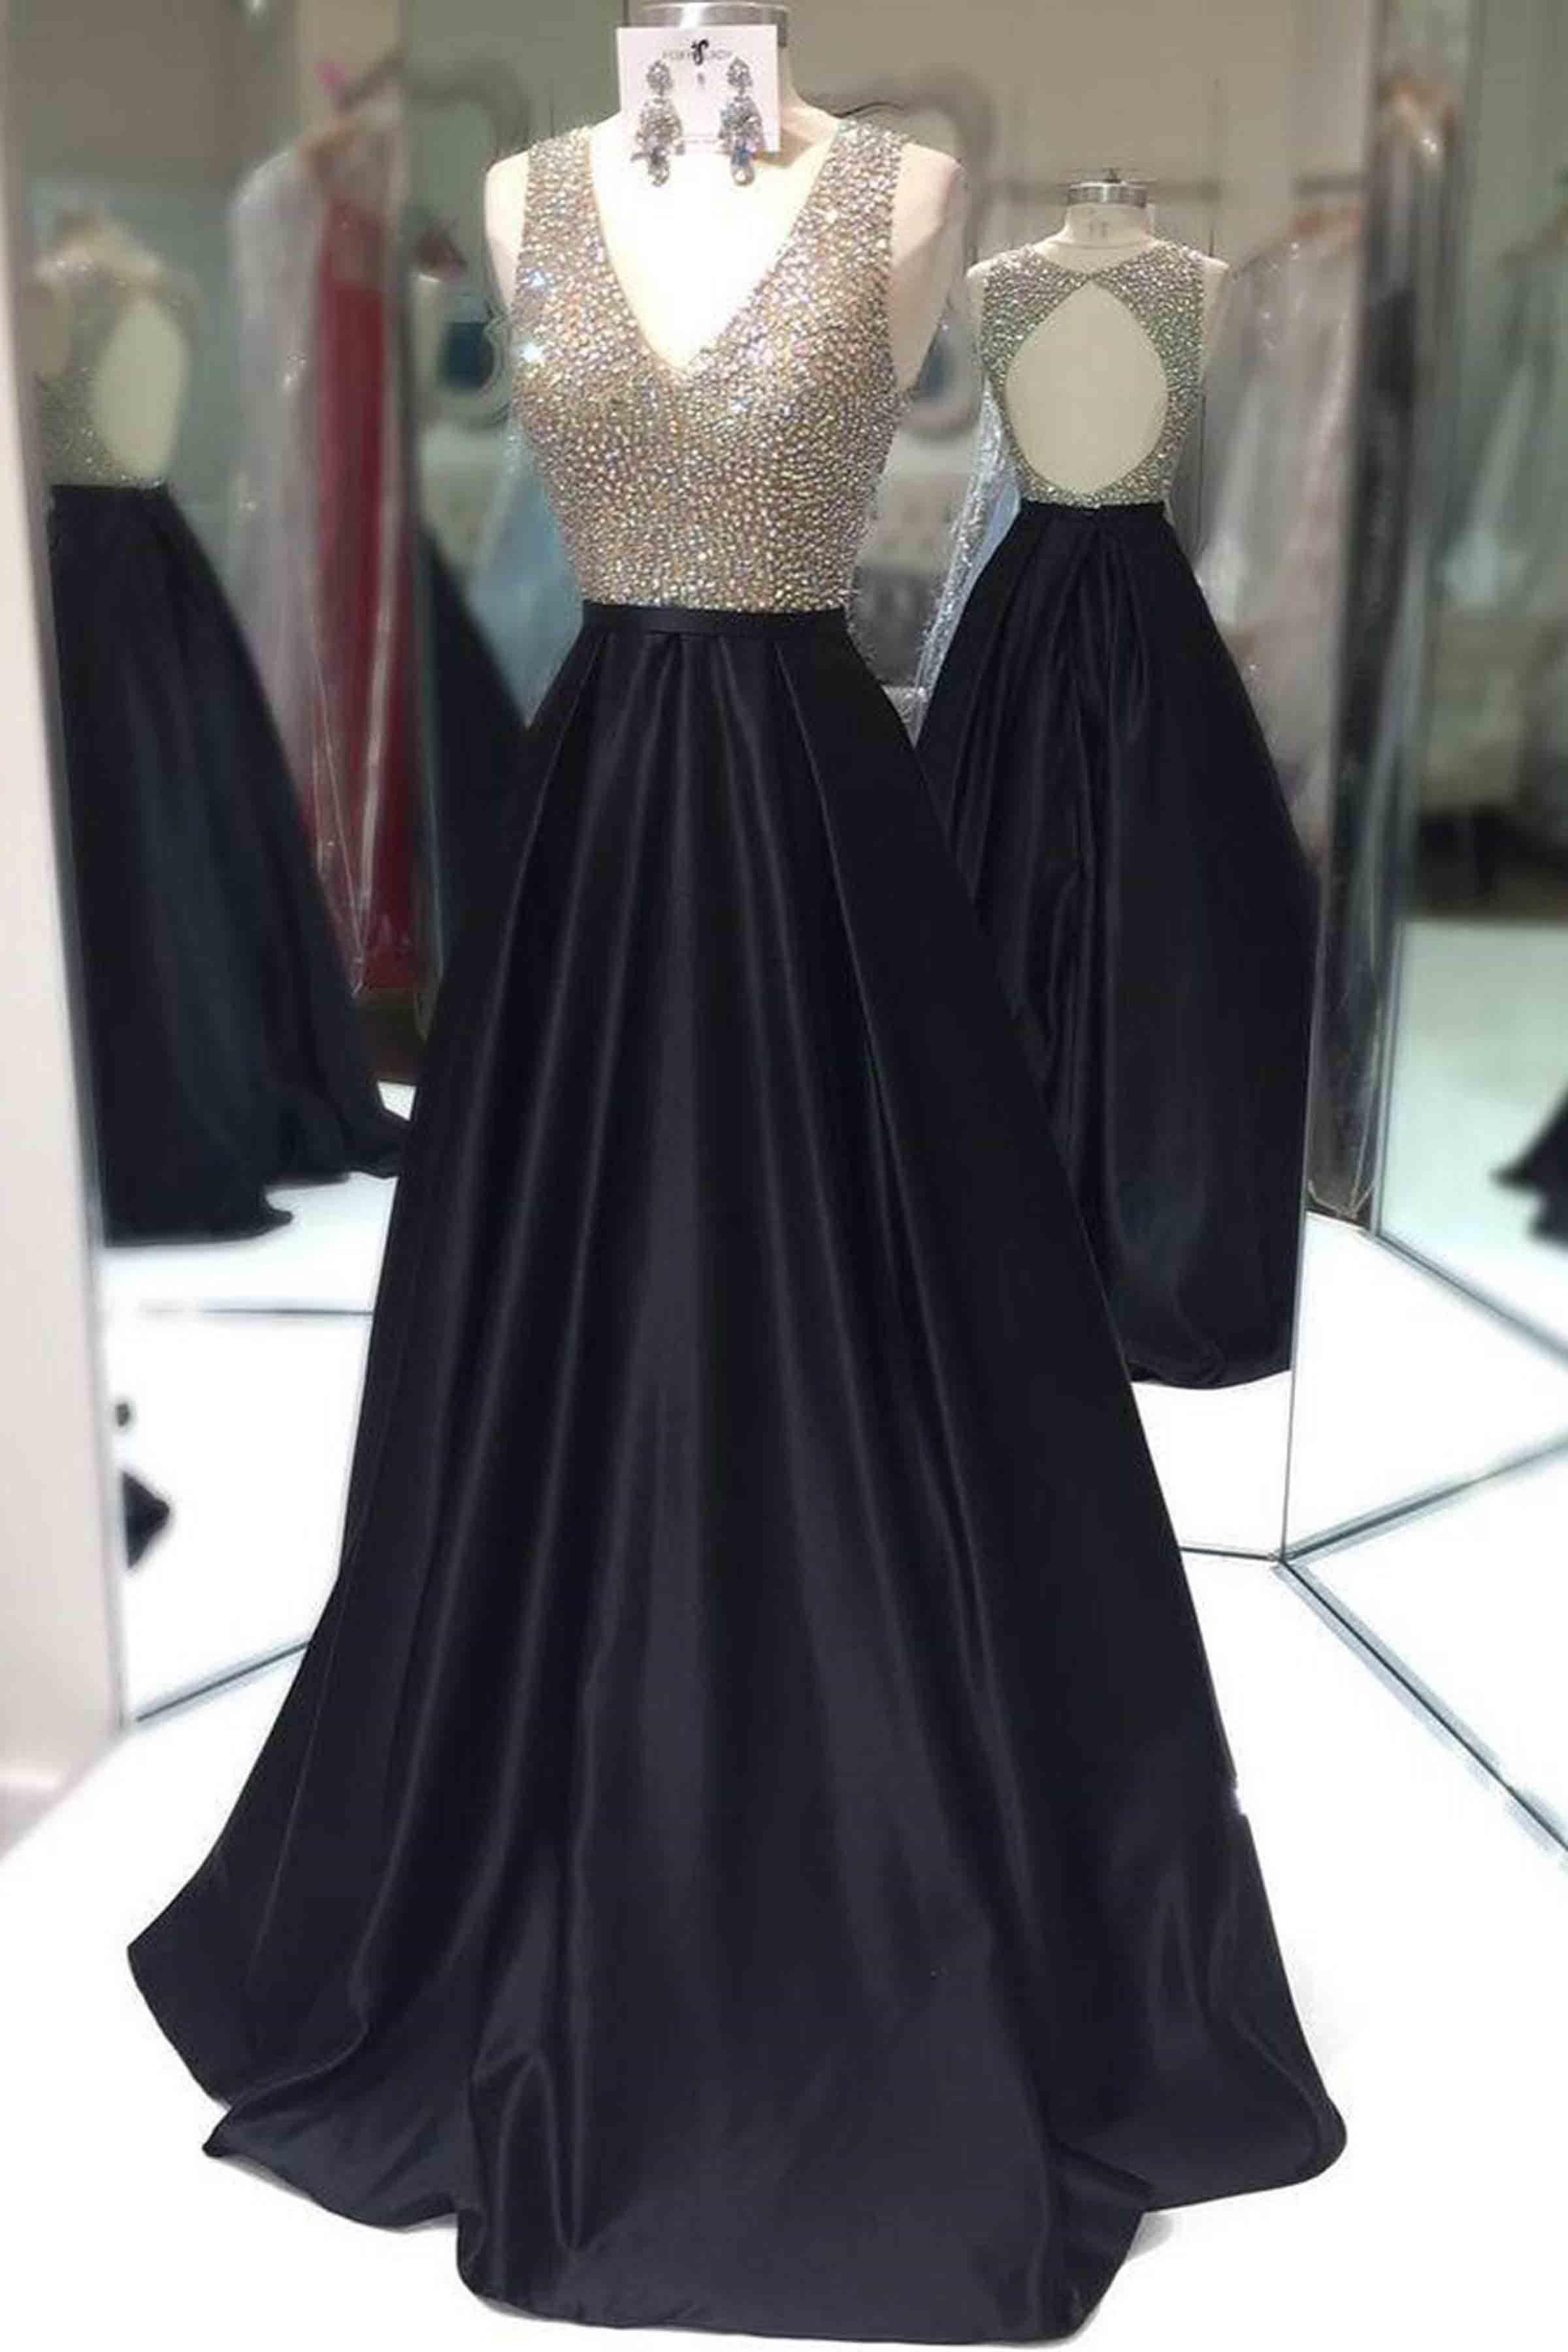 Cute sequins top black satin long prom dress prom pinterest